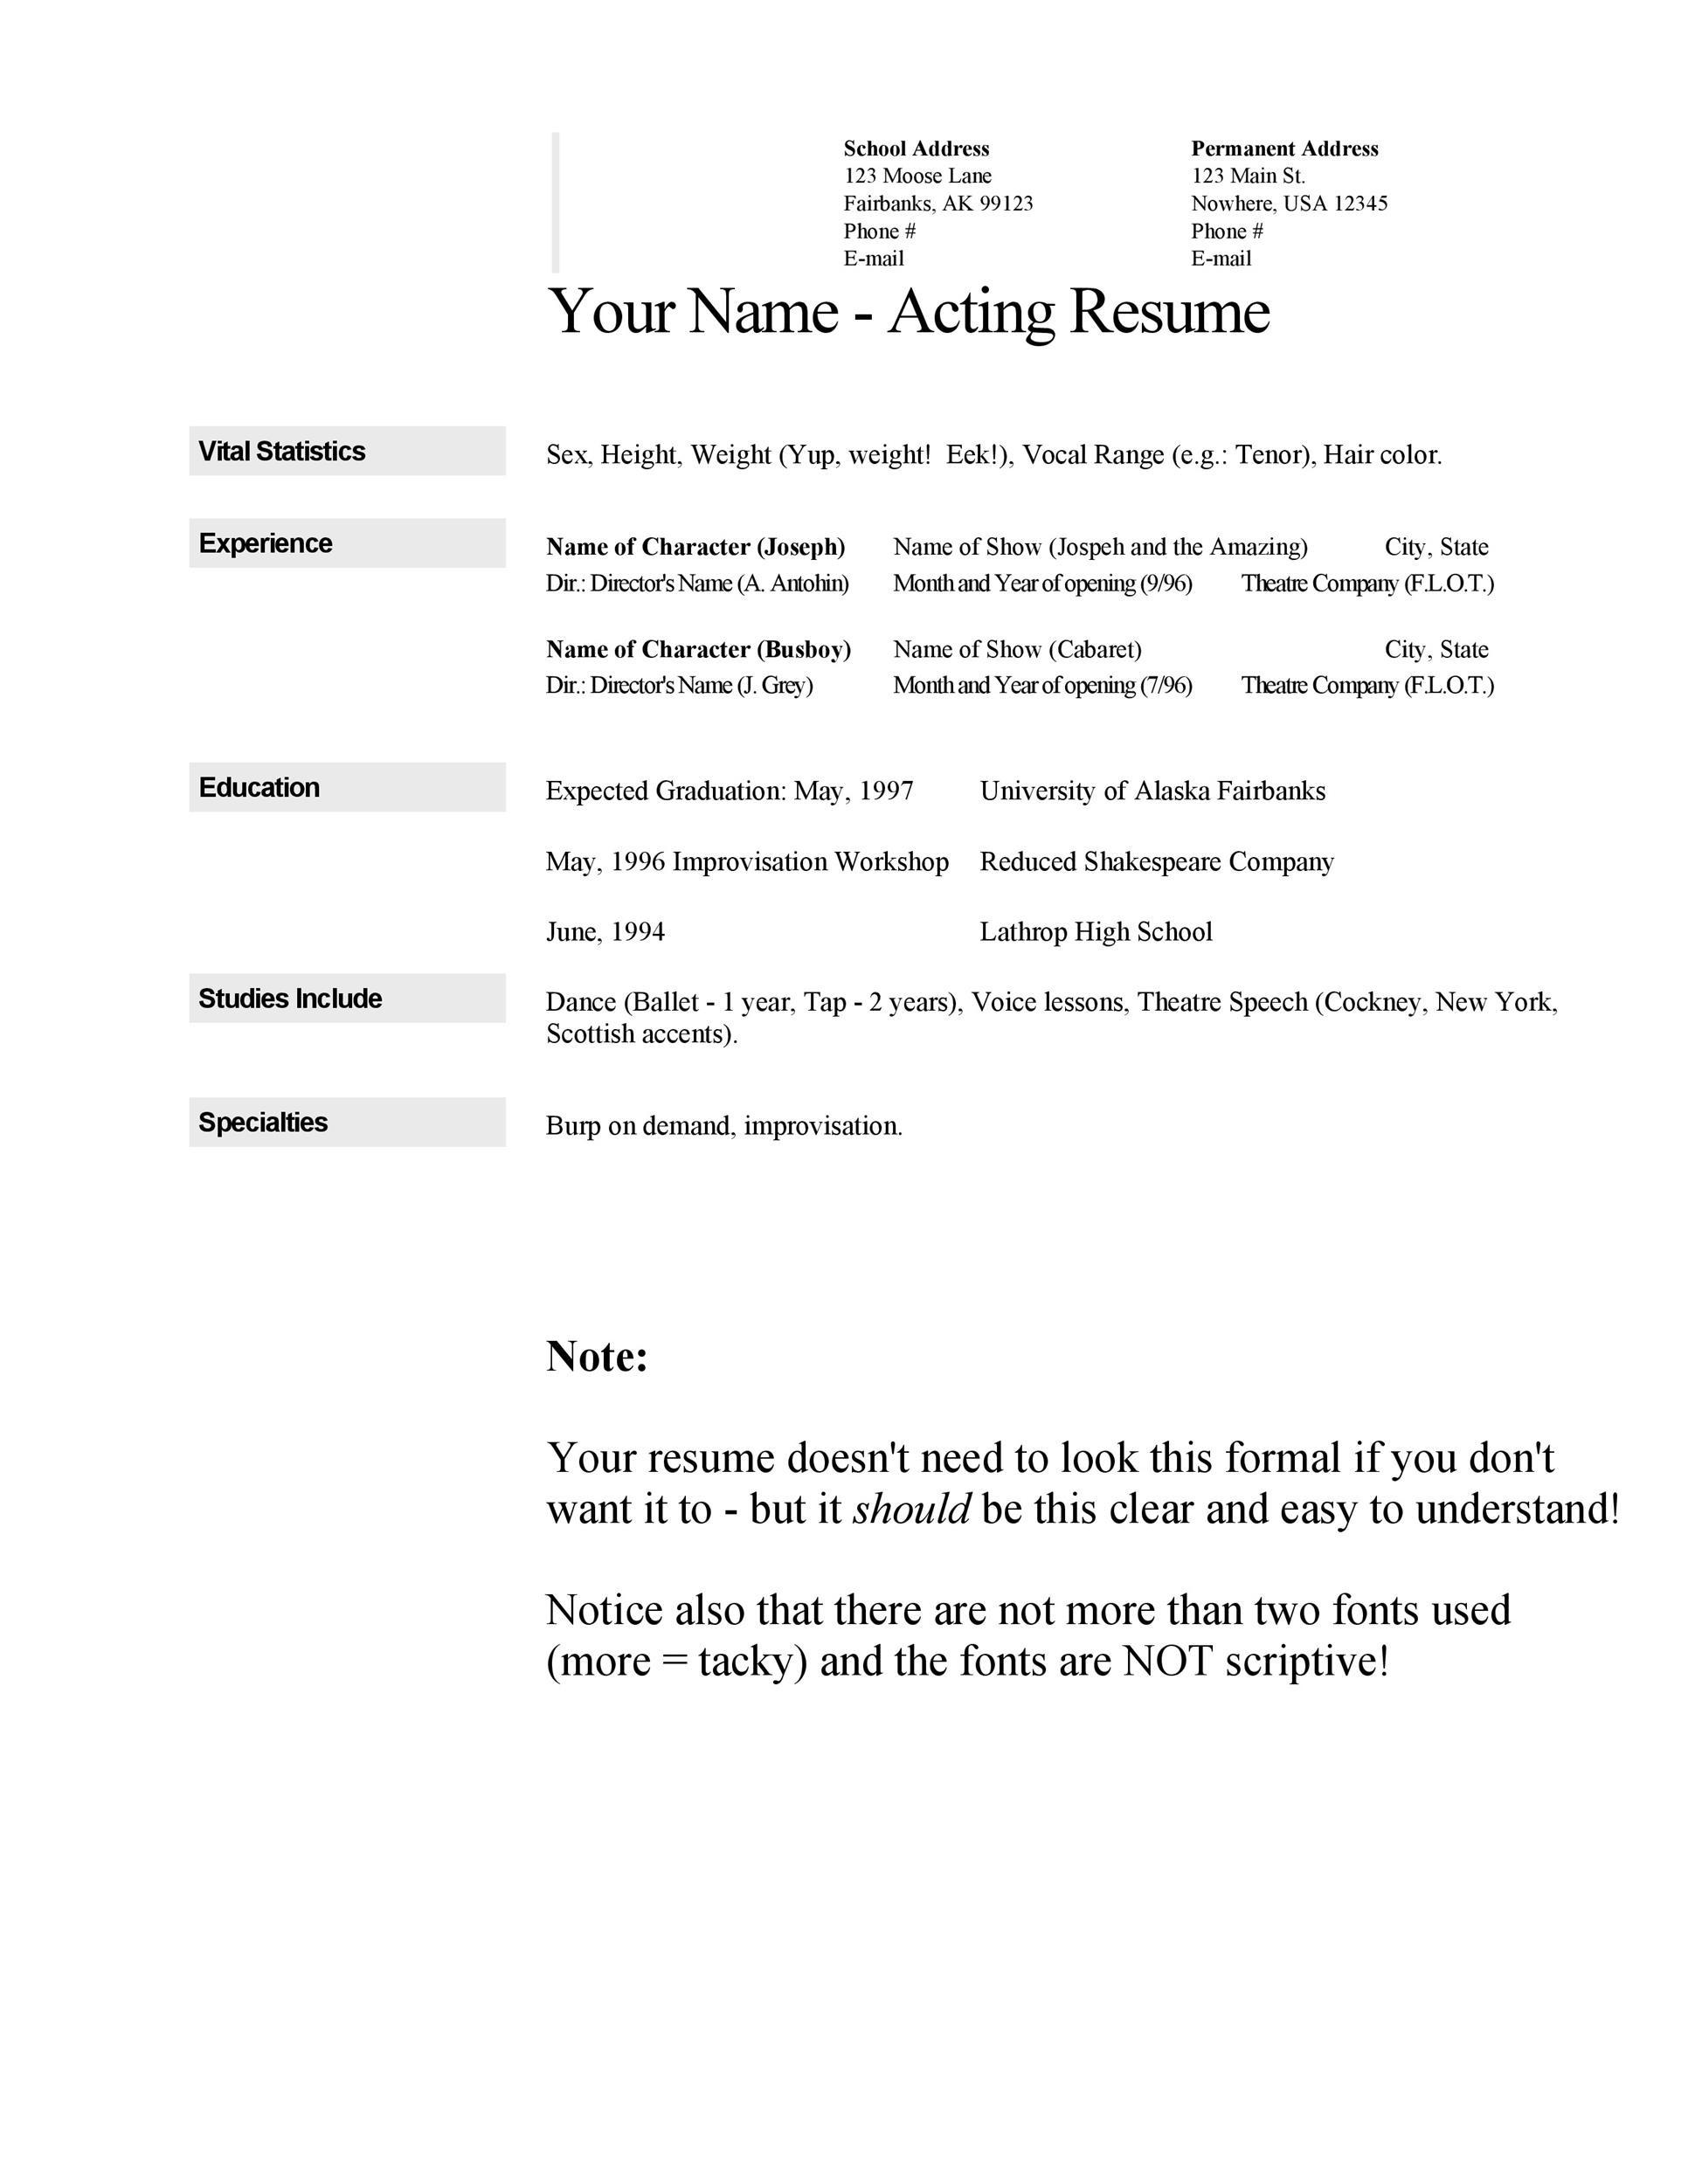 50 FREE Acting Resume Templates (Word & Google Docs) ᐅ